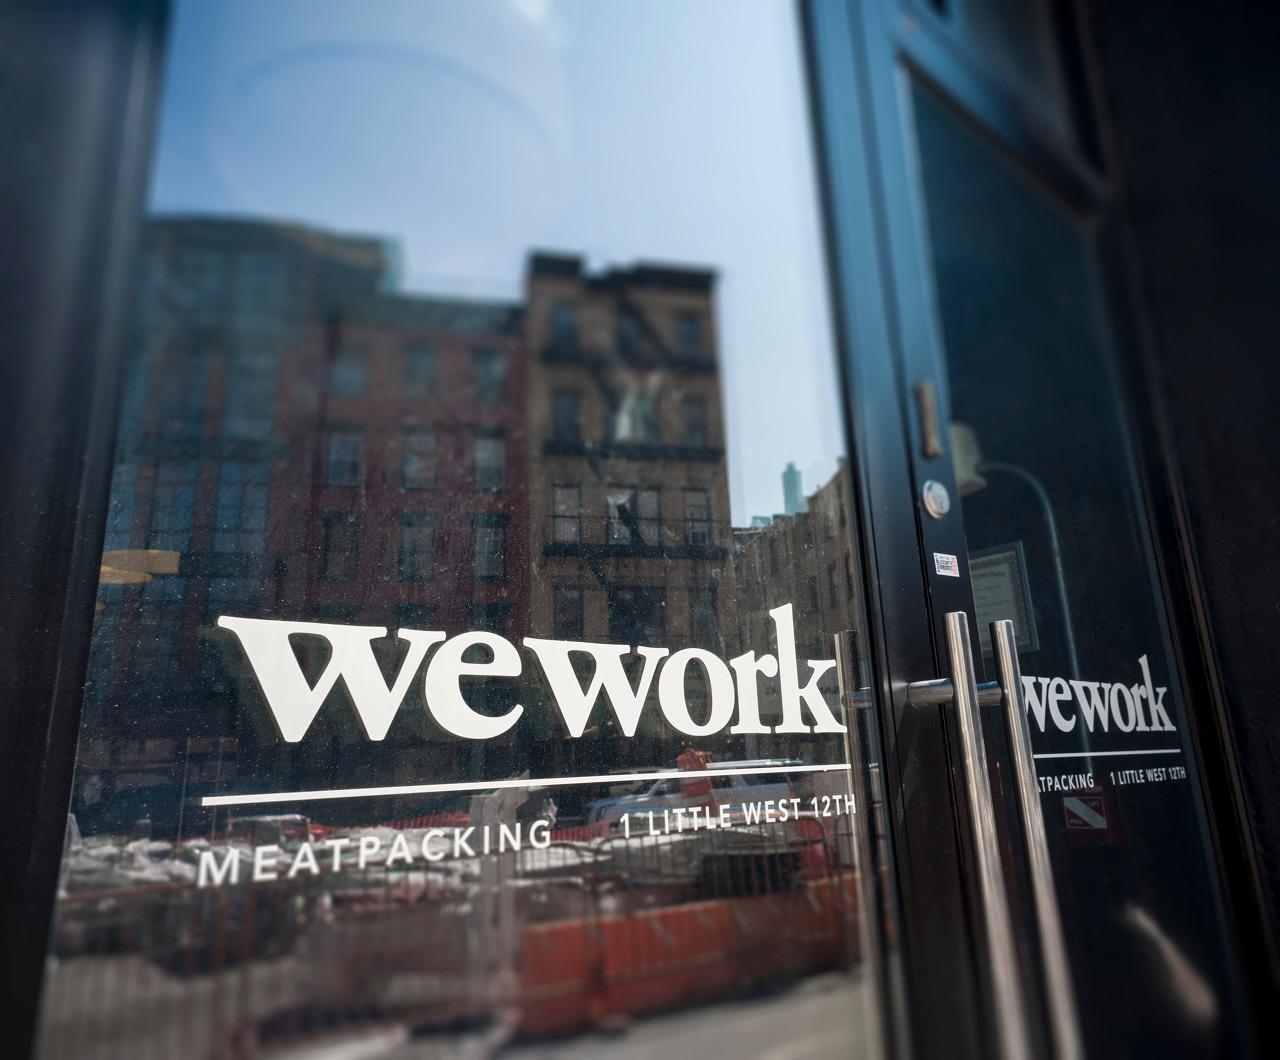 WeWork,一个跨洋大骗局?